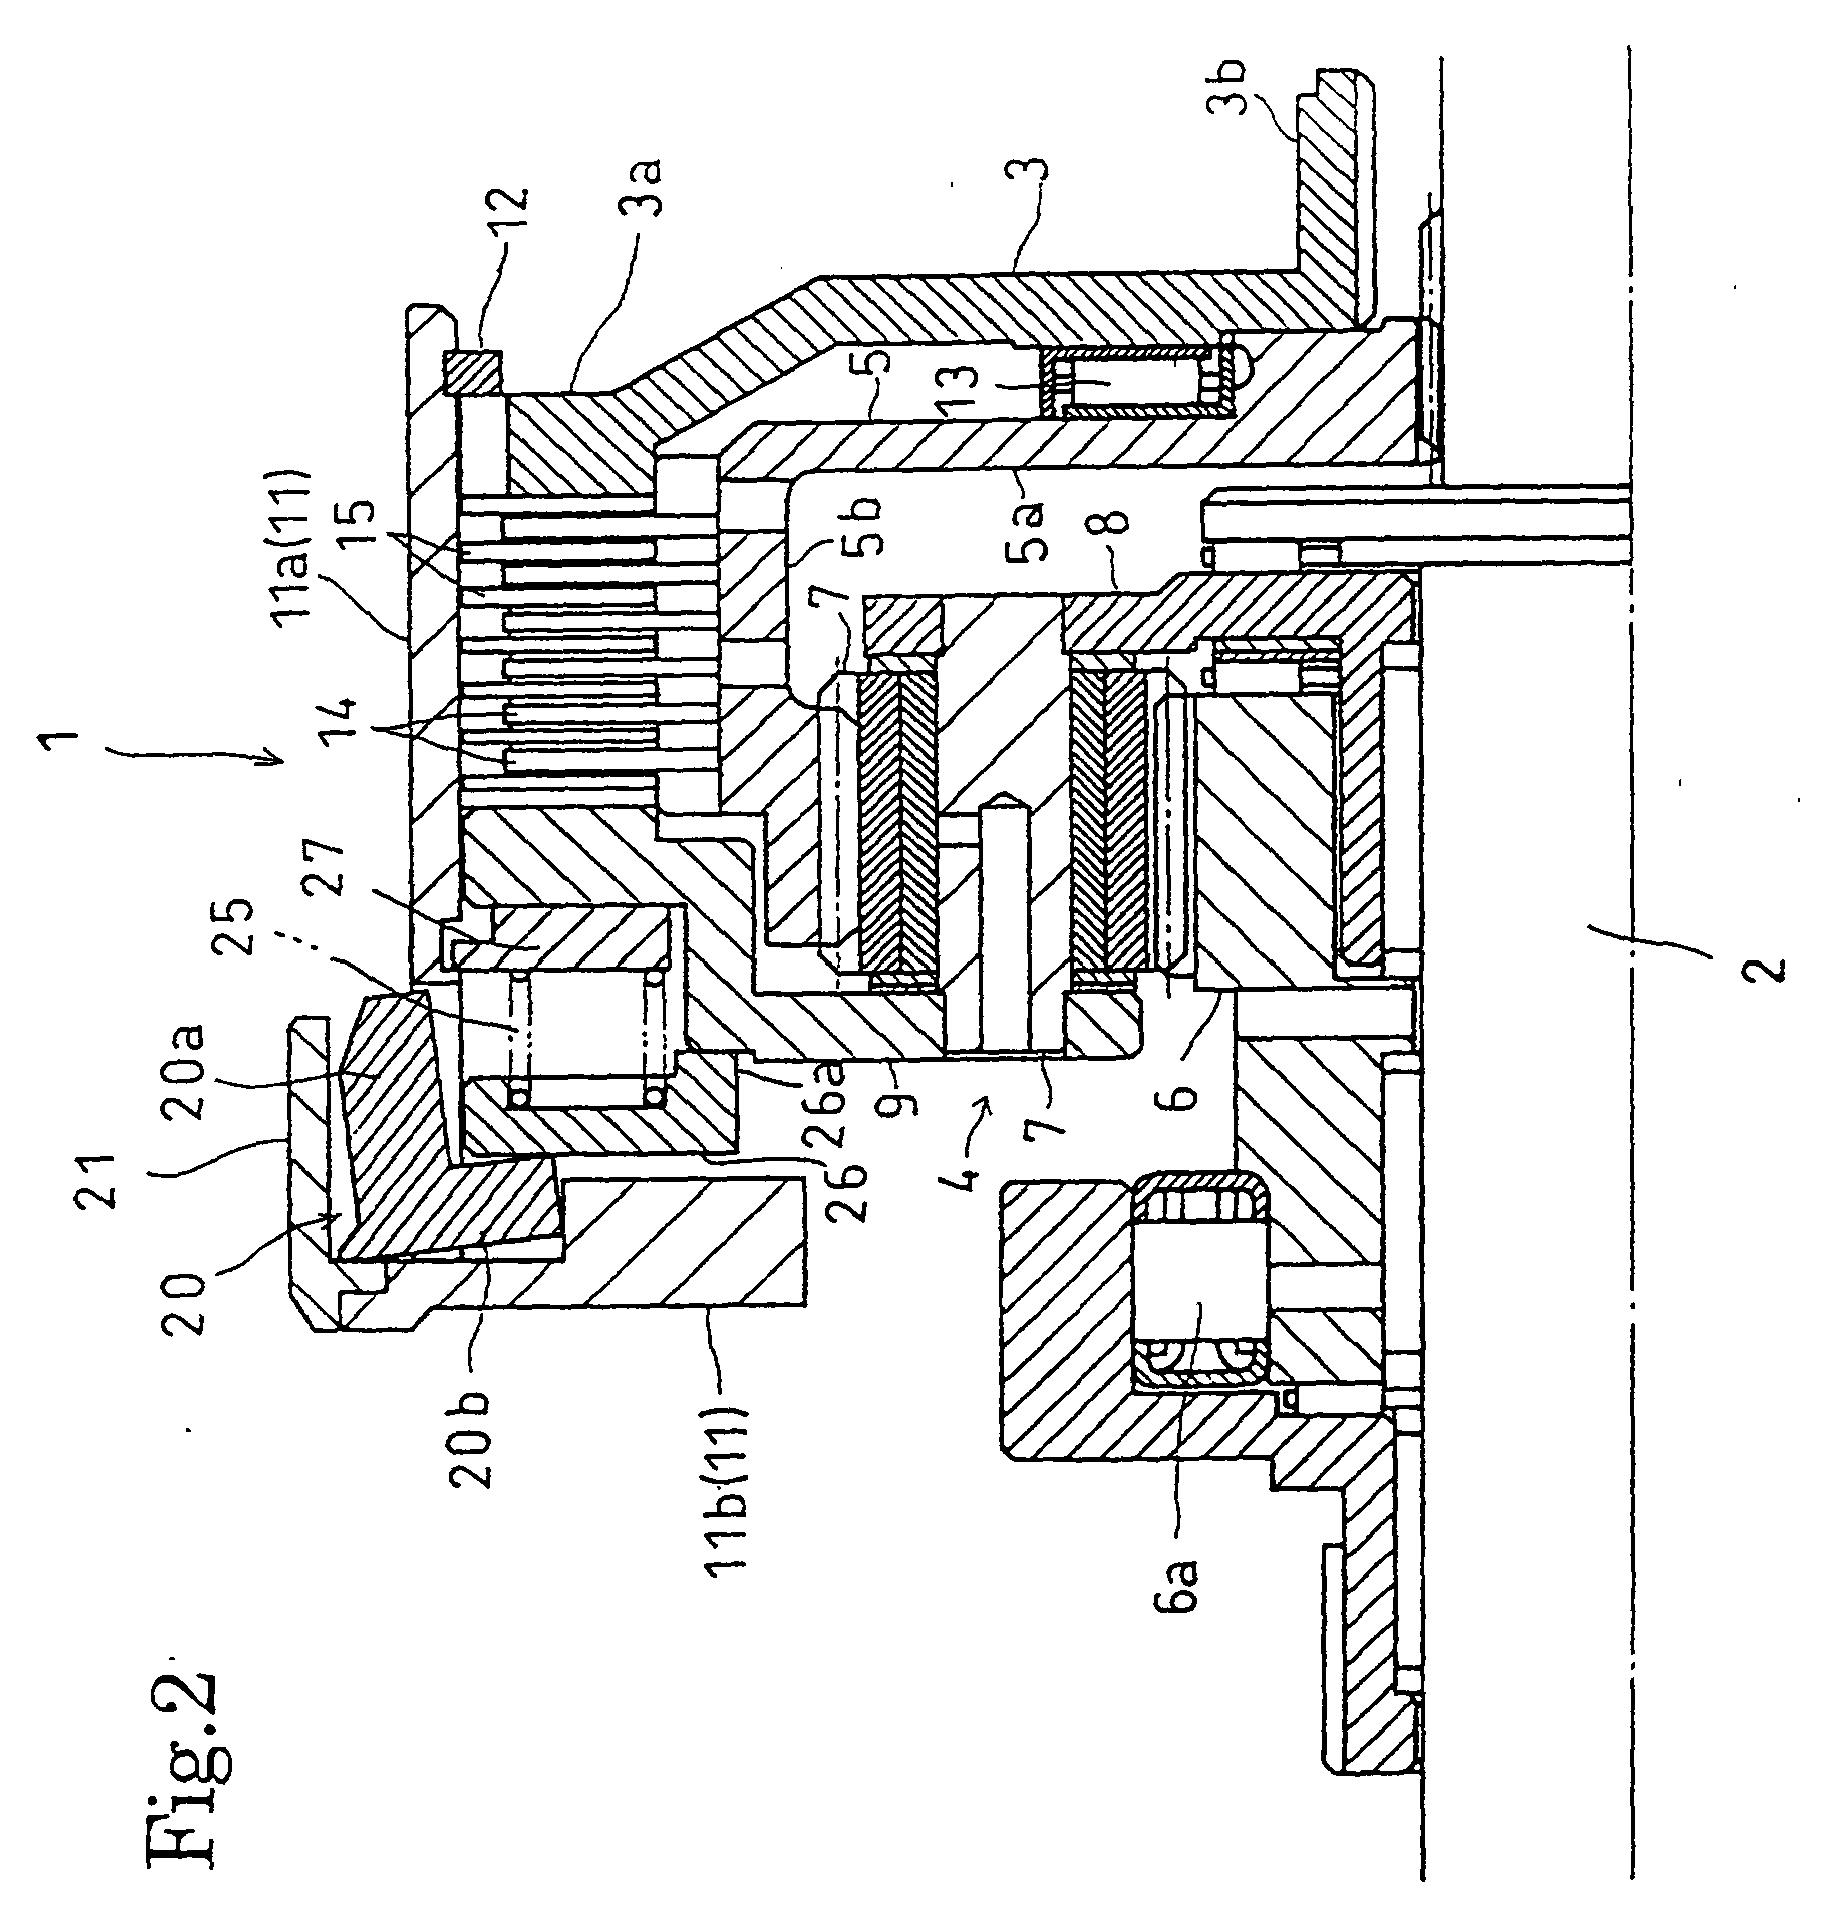 patent ep1108915b1